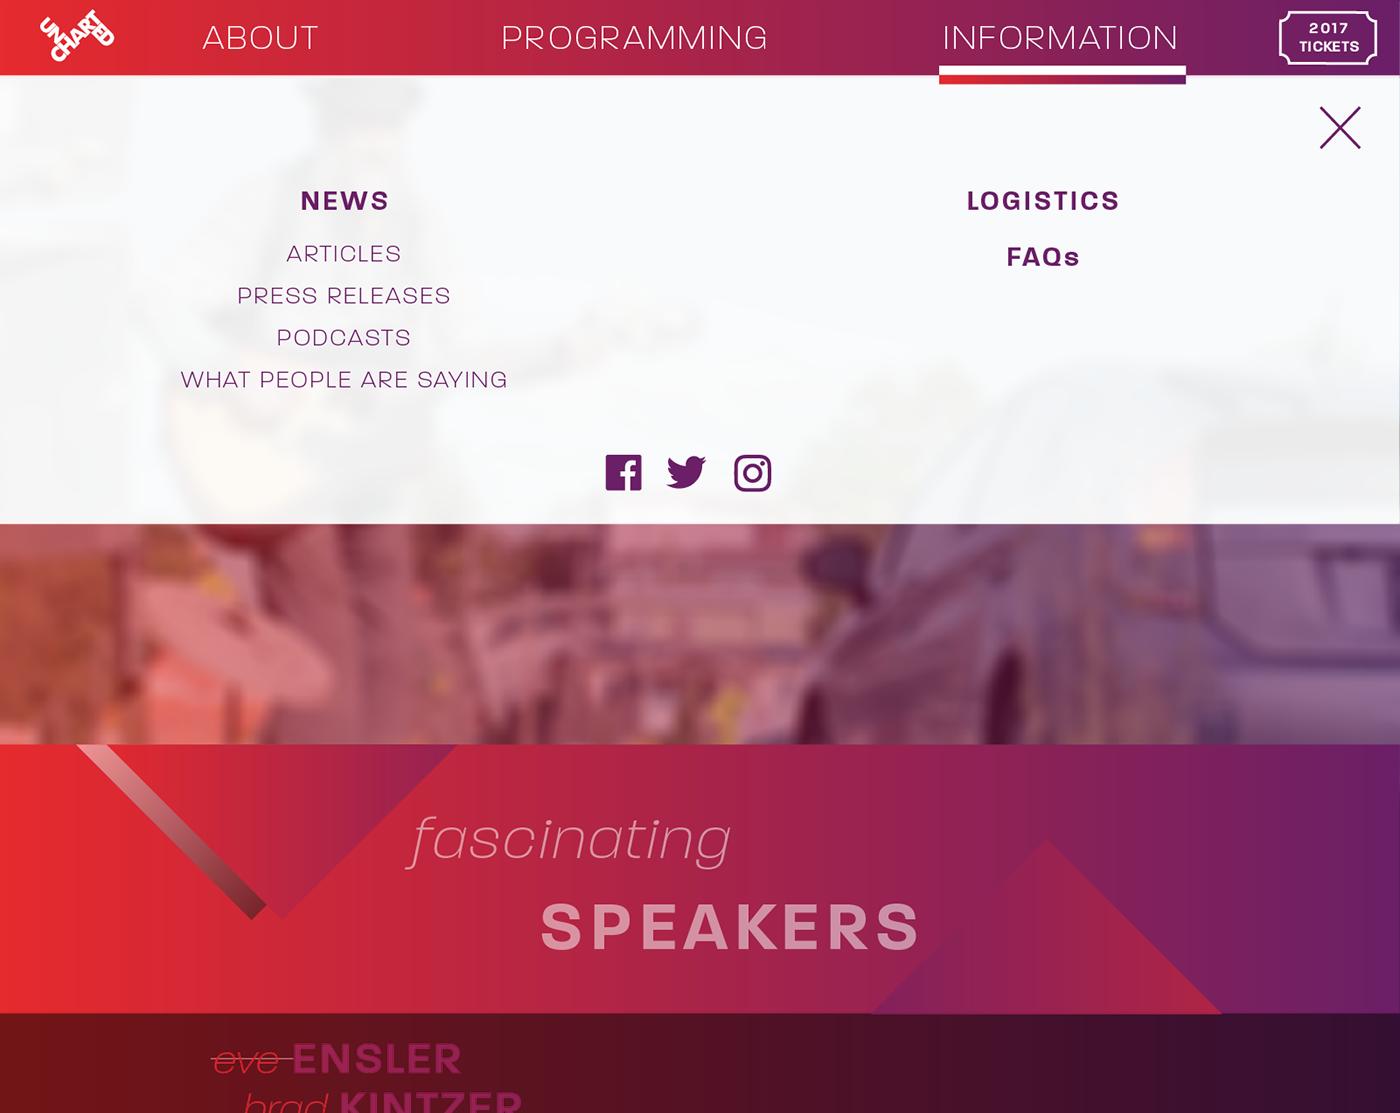 berkeleyside uncharted more information menu